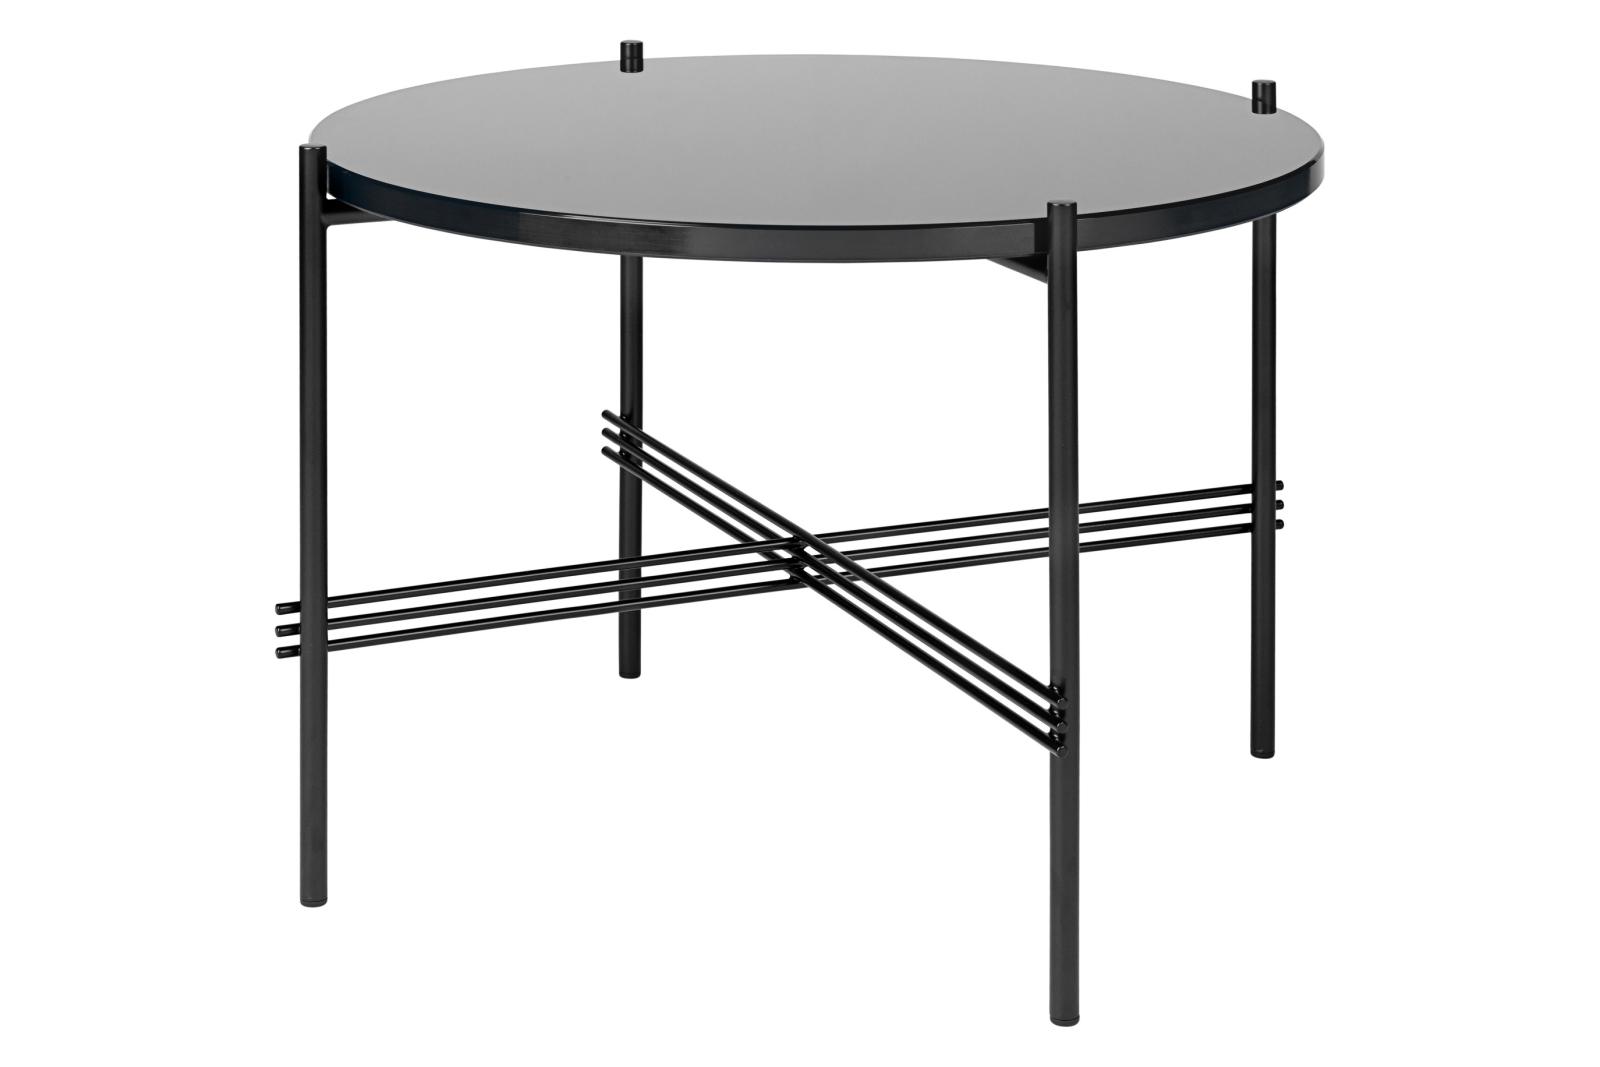 TS Round Coffee Table with Glass Top - Black Frame Gubi Glass Graphite Black, Ø 55 x H 41 cm